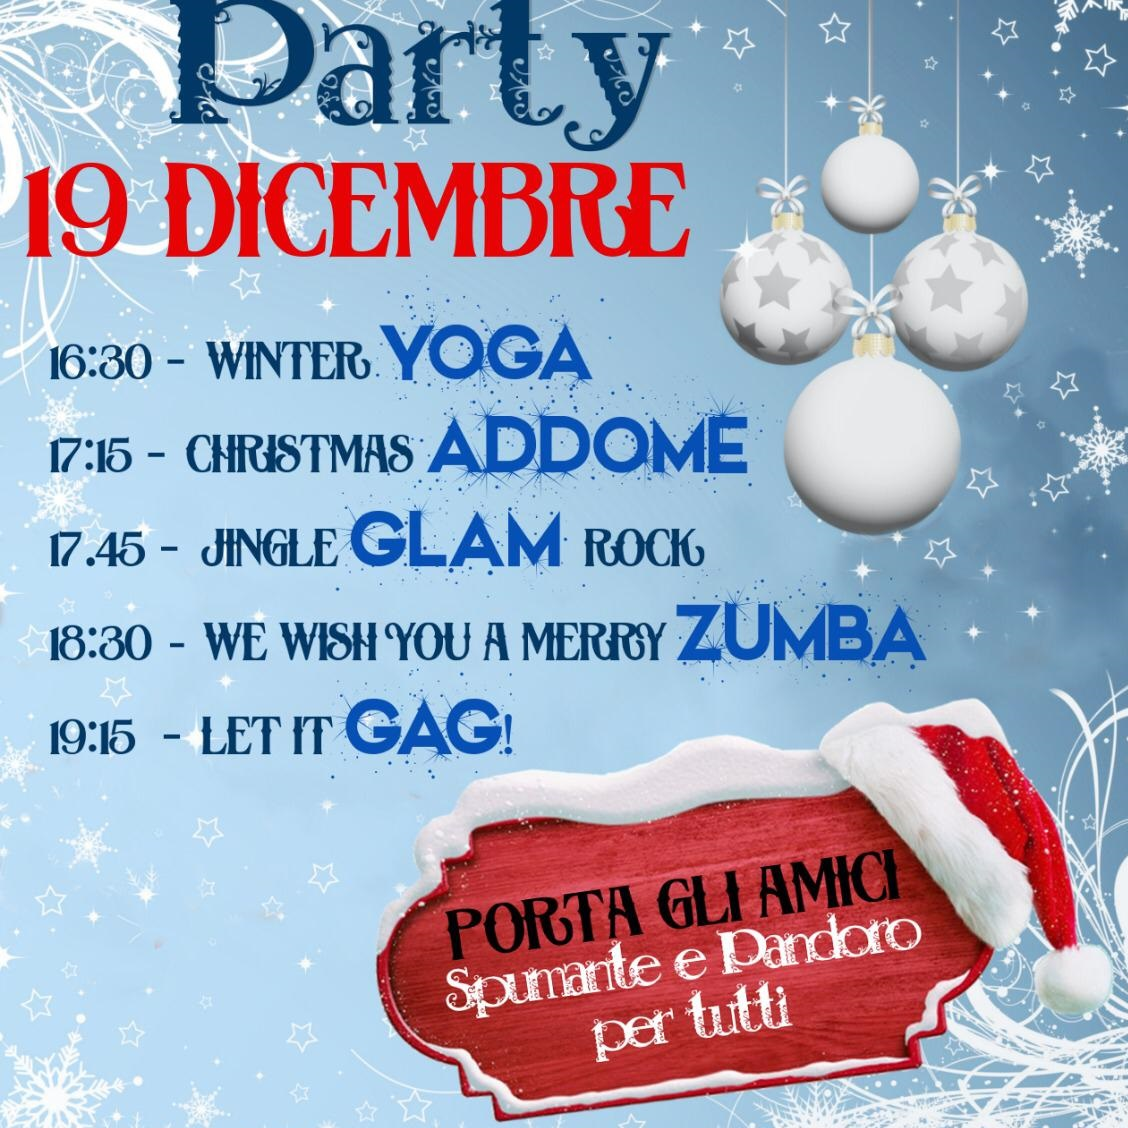 Auguri Di Natale Zumba.Natale Archivi Palestra Genova Centri Palagym